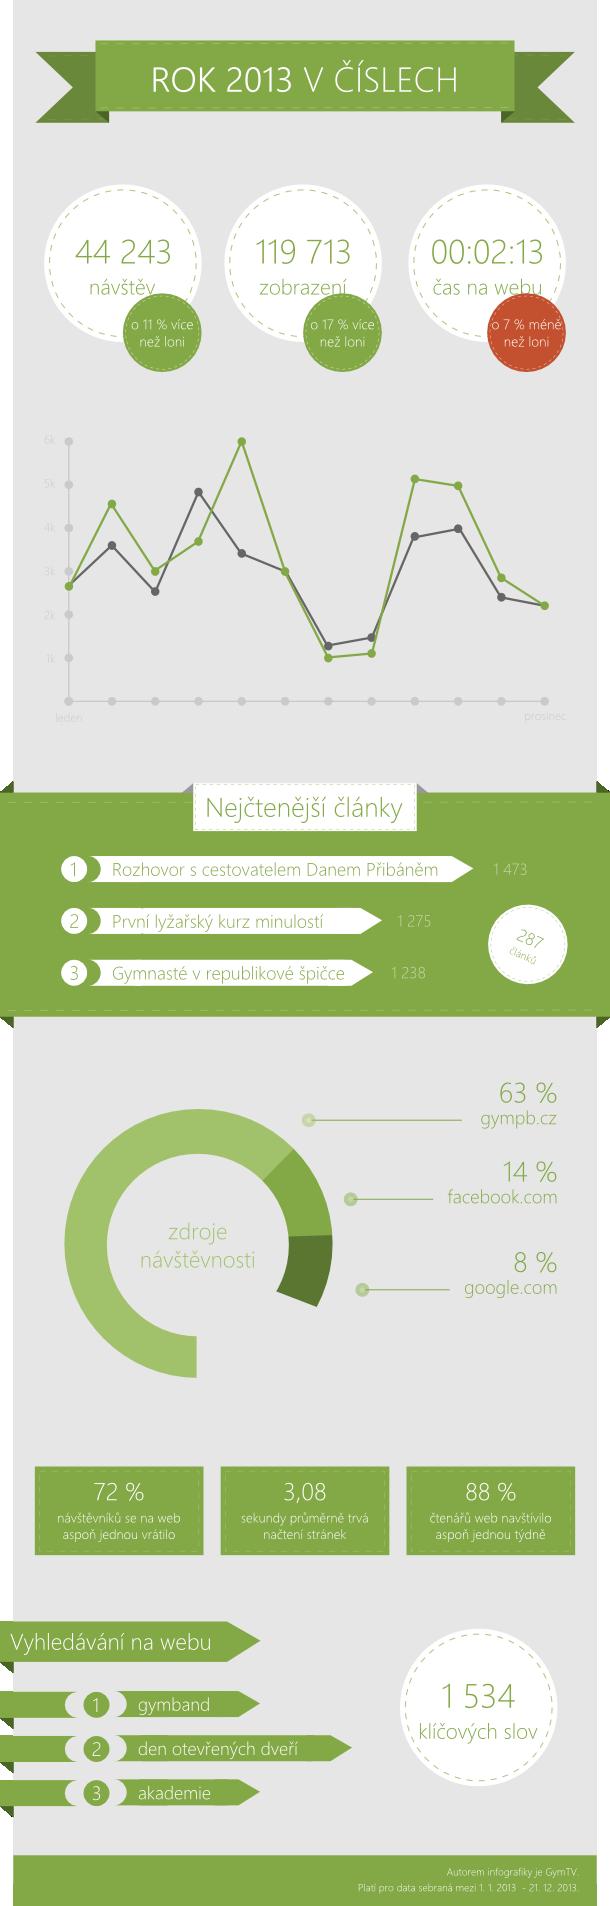 infografika2013